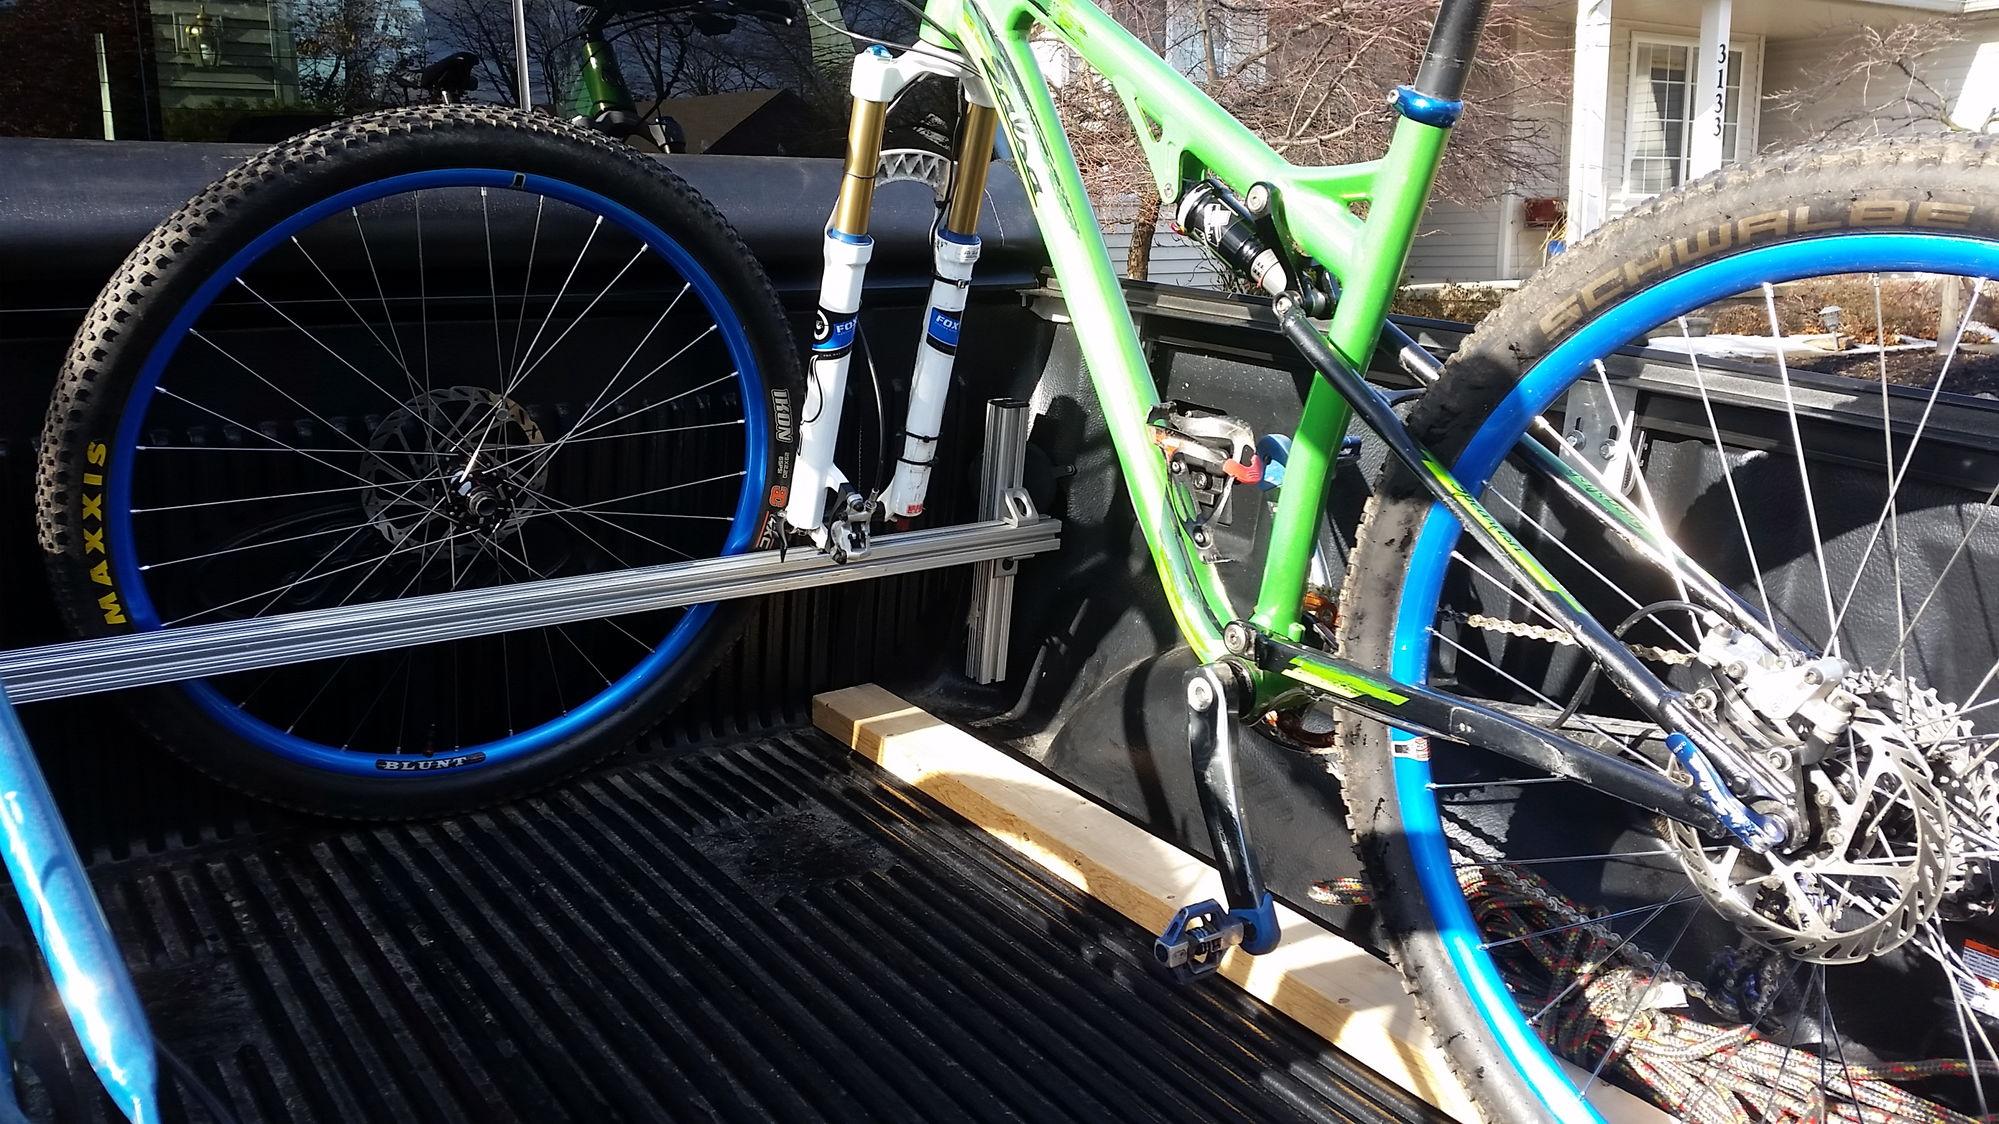 Adjustable Bed Rack 80 20 Ford F150 Forum Community